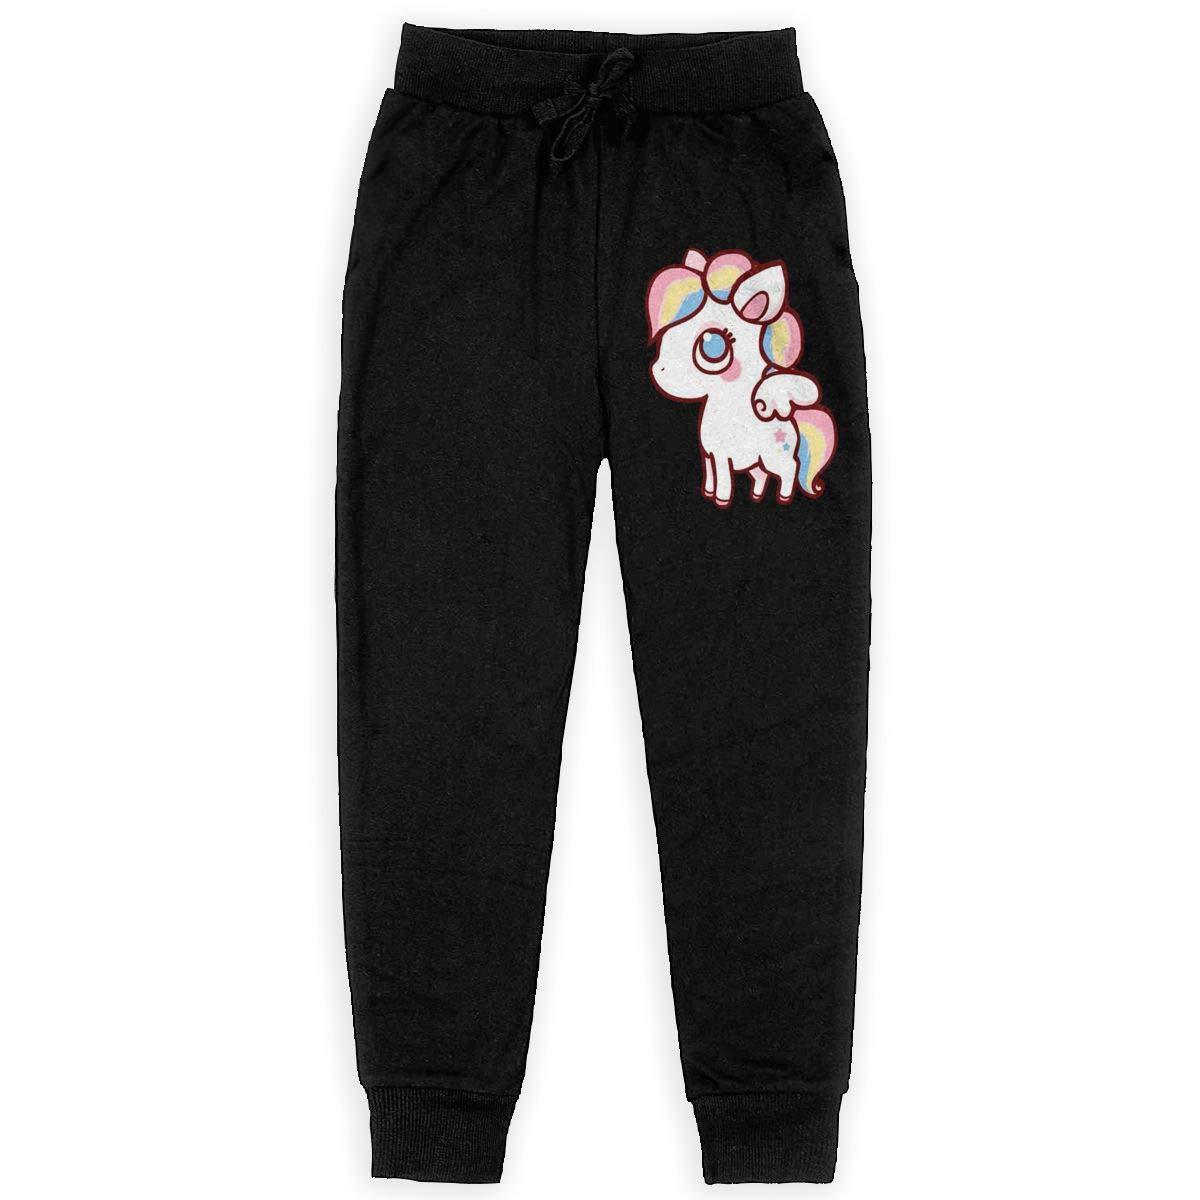 Unicorn Boys Athletic Smart Fleece Pant Youth Soft and Cozy Sweatpants